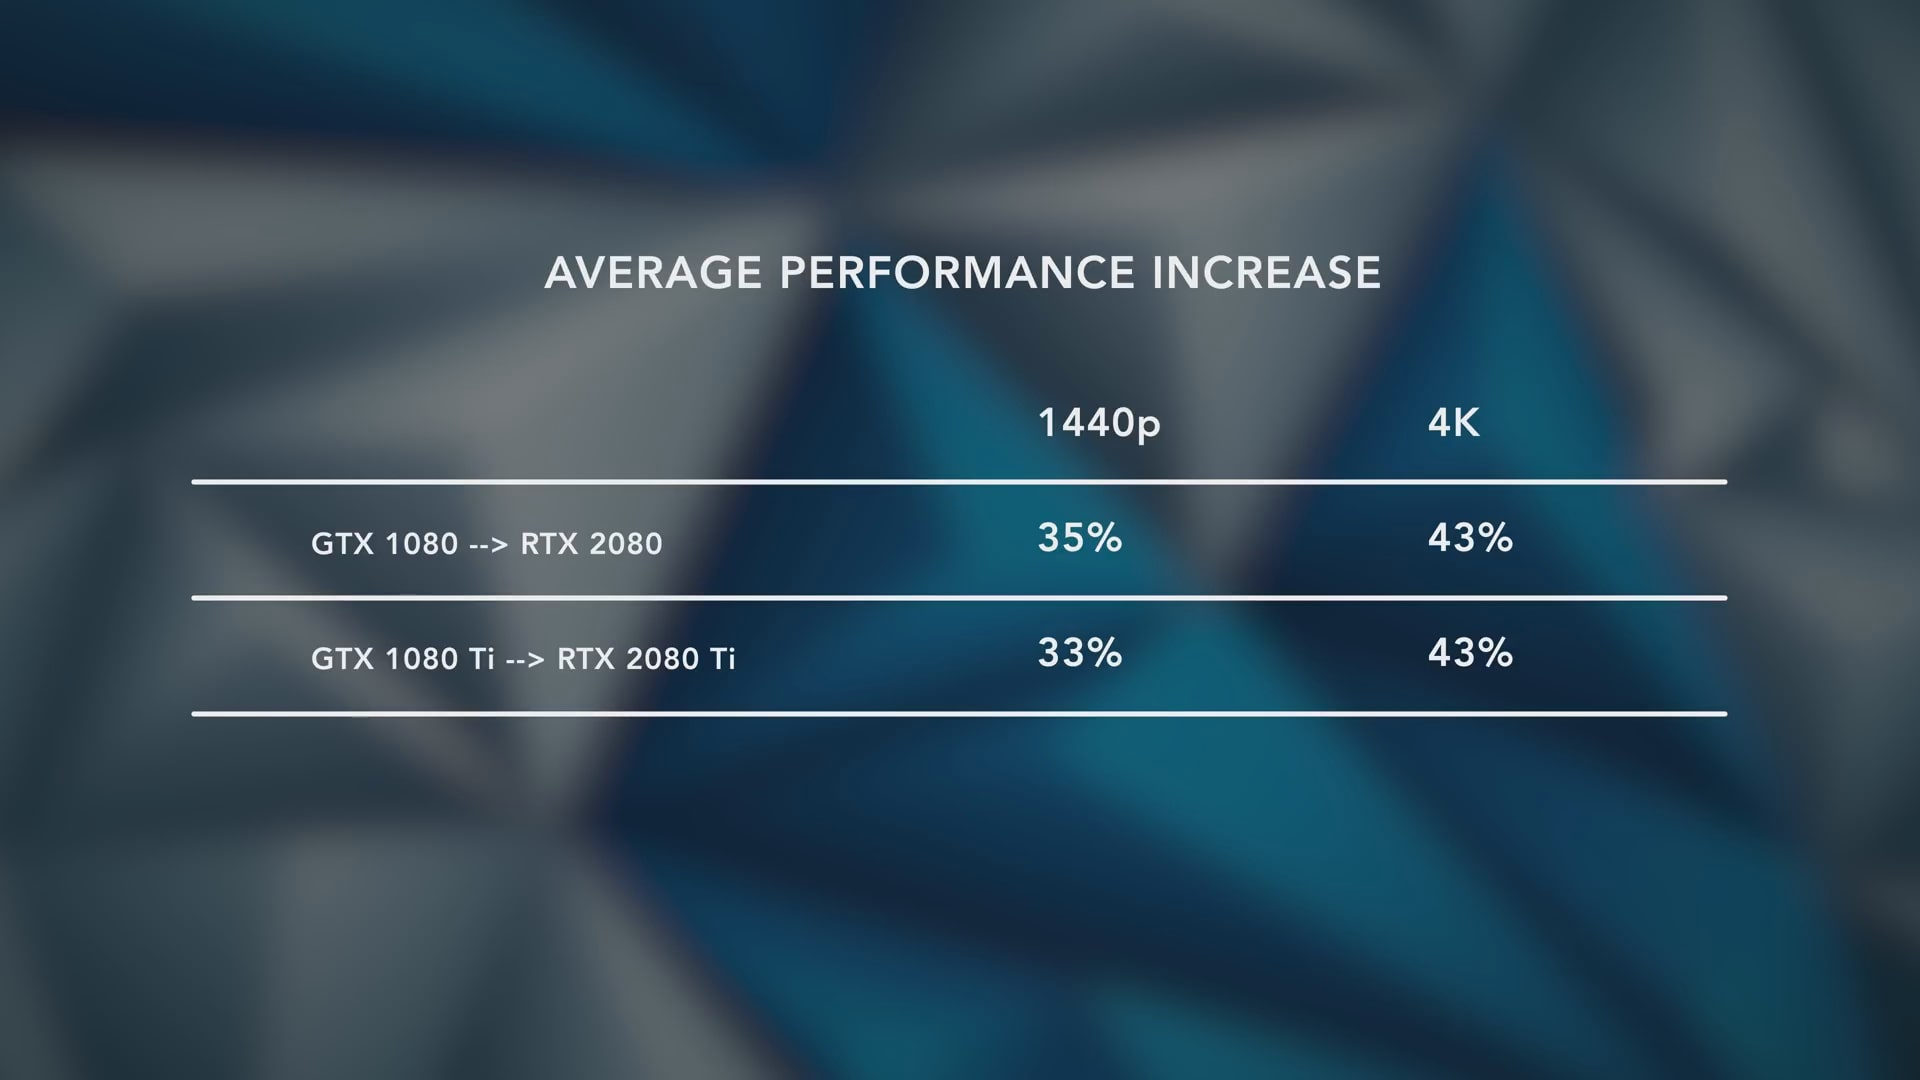 Average performance RTX 2080 Ti vs GTX 1080 Ti